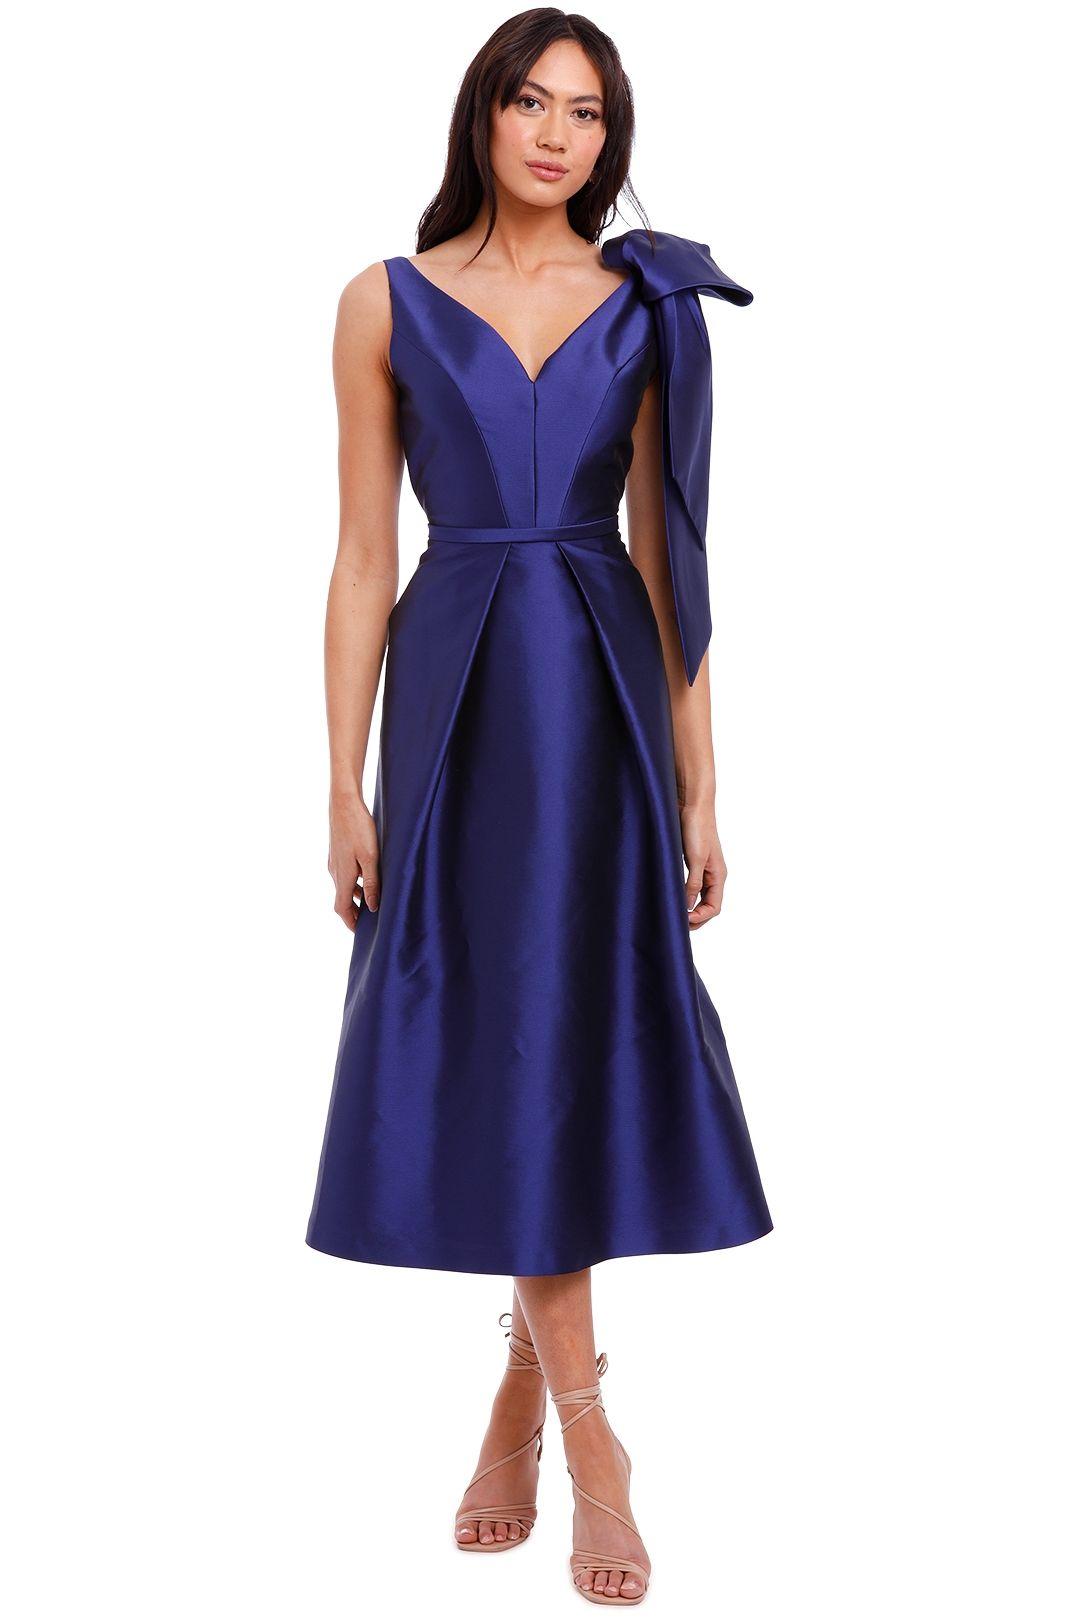 Anthea Crawford Regal Twill Bow Dress